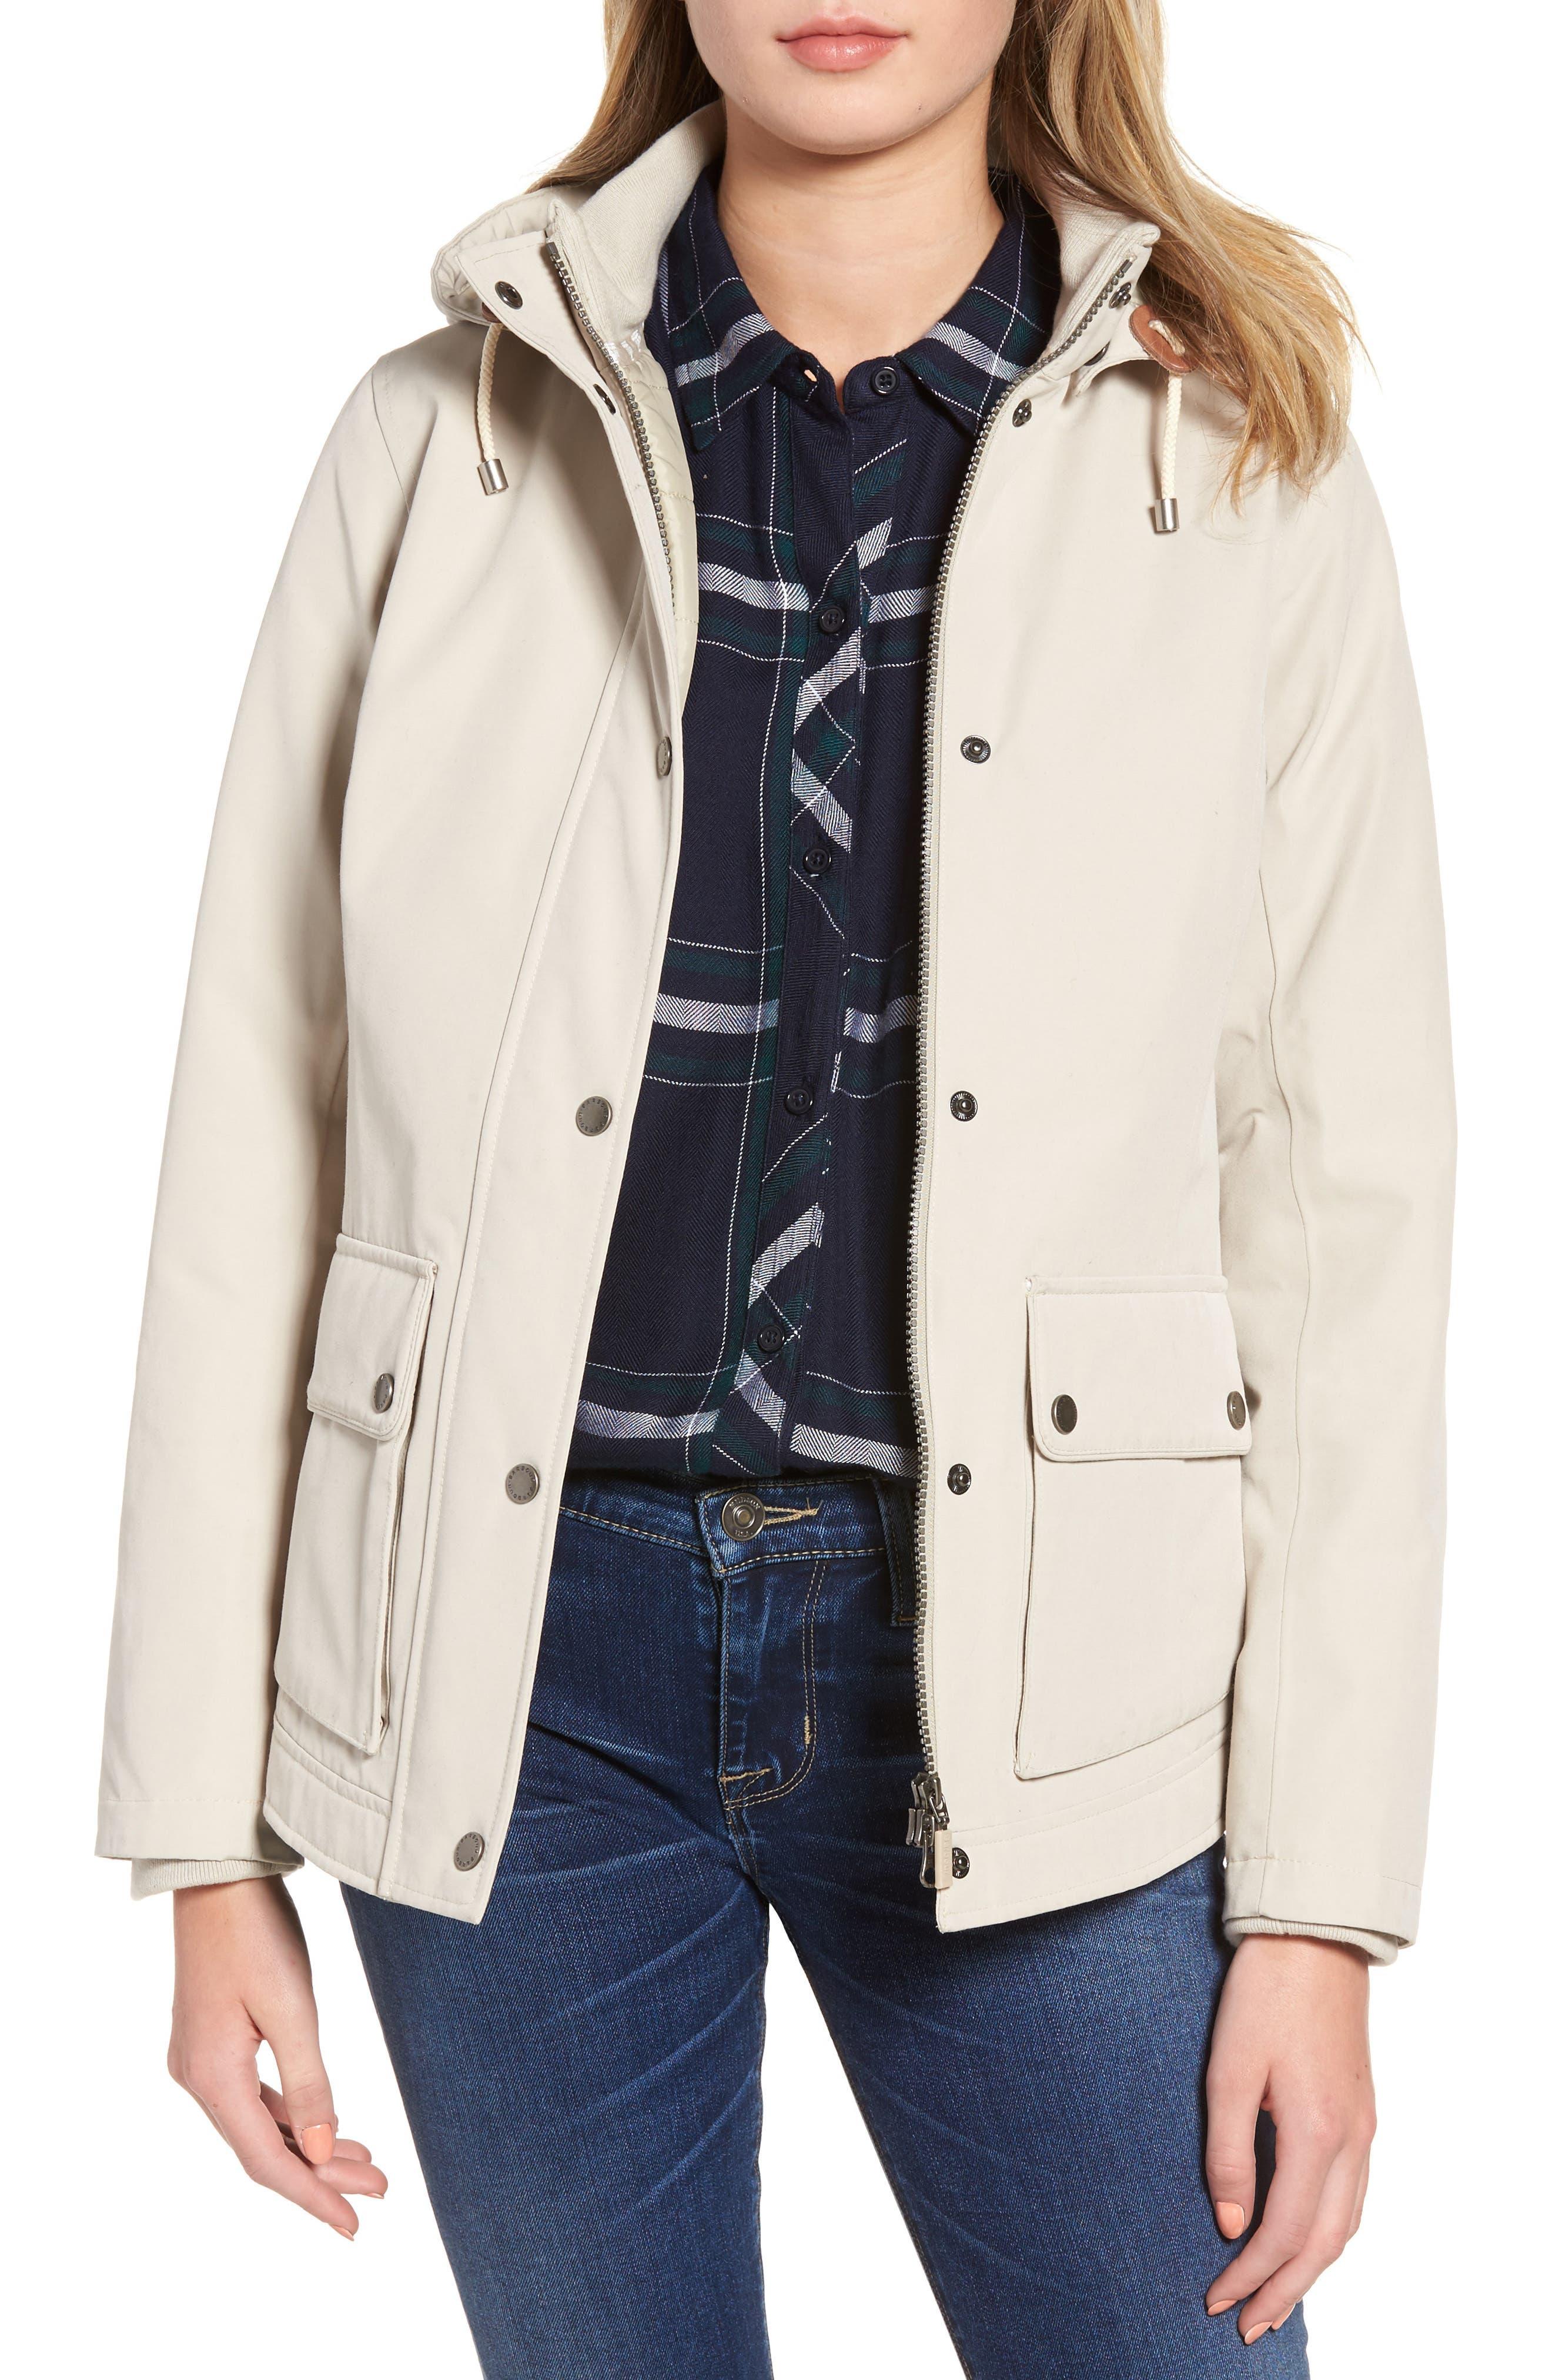 Seaton Hooded Waterproof Jacket,                         Main,                         color, Mist